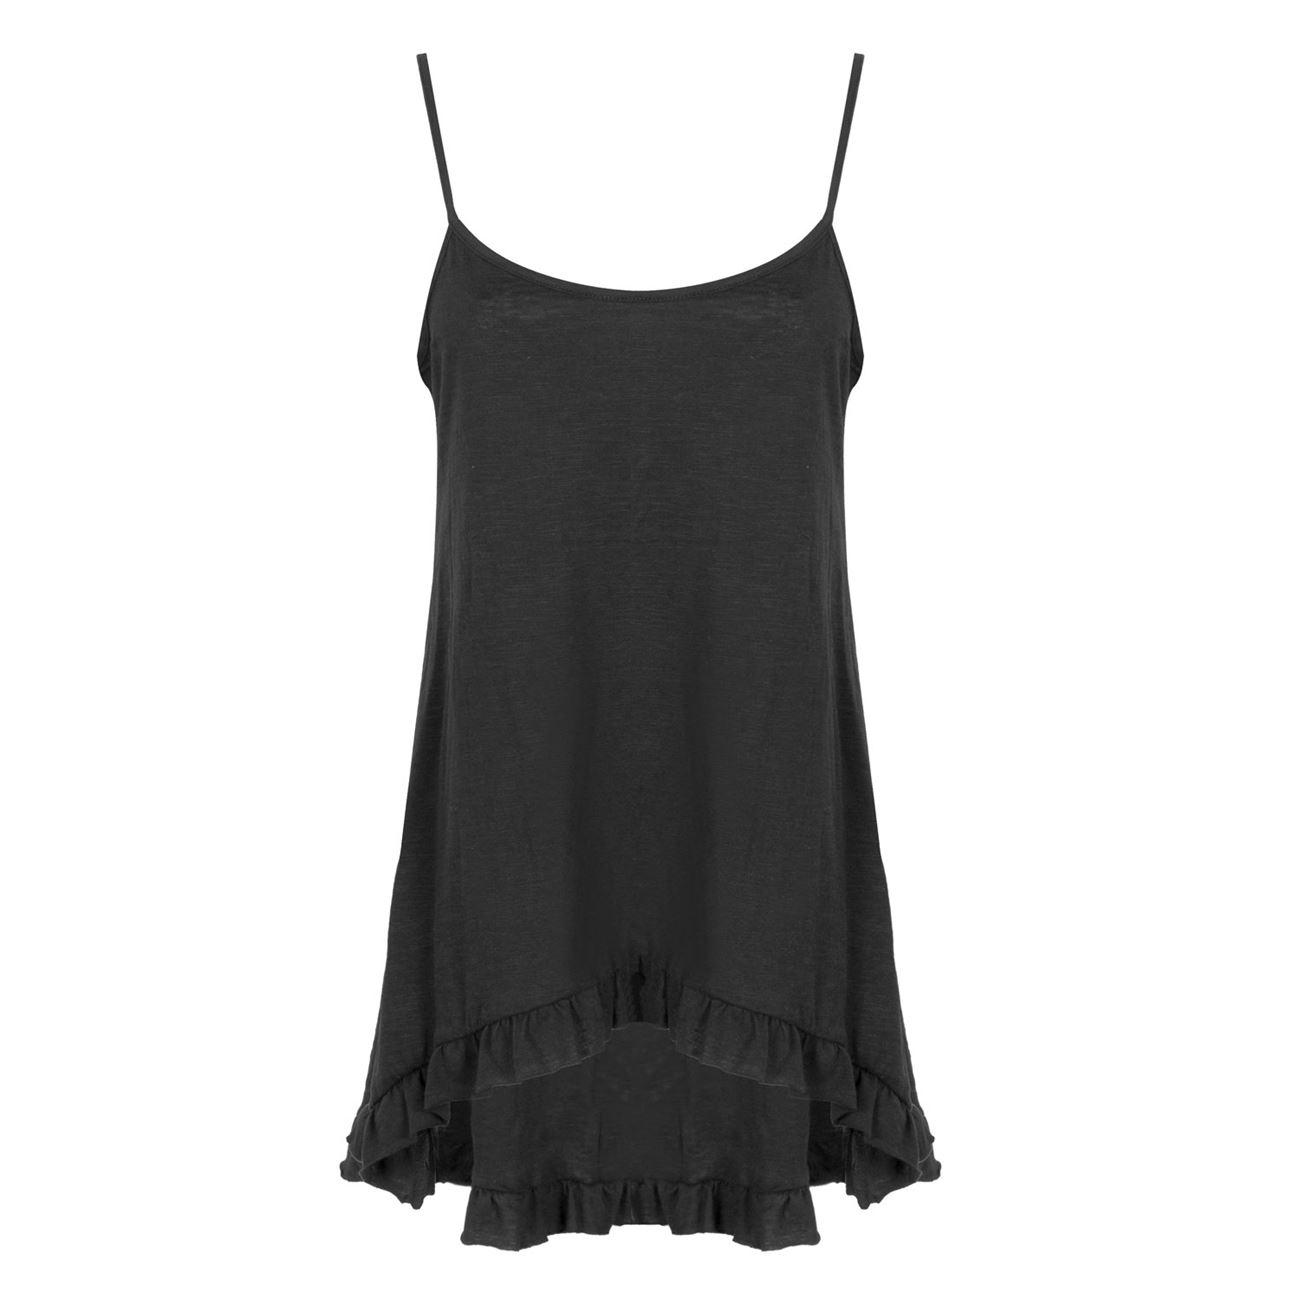 32300a82ece Μπλούζα Γυναικεία Αμάνικη Μαύρη Ασύμμετρη Βολάν - One Size